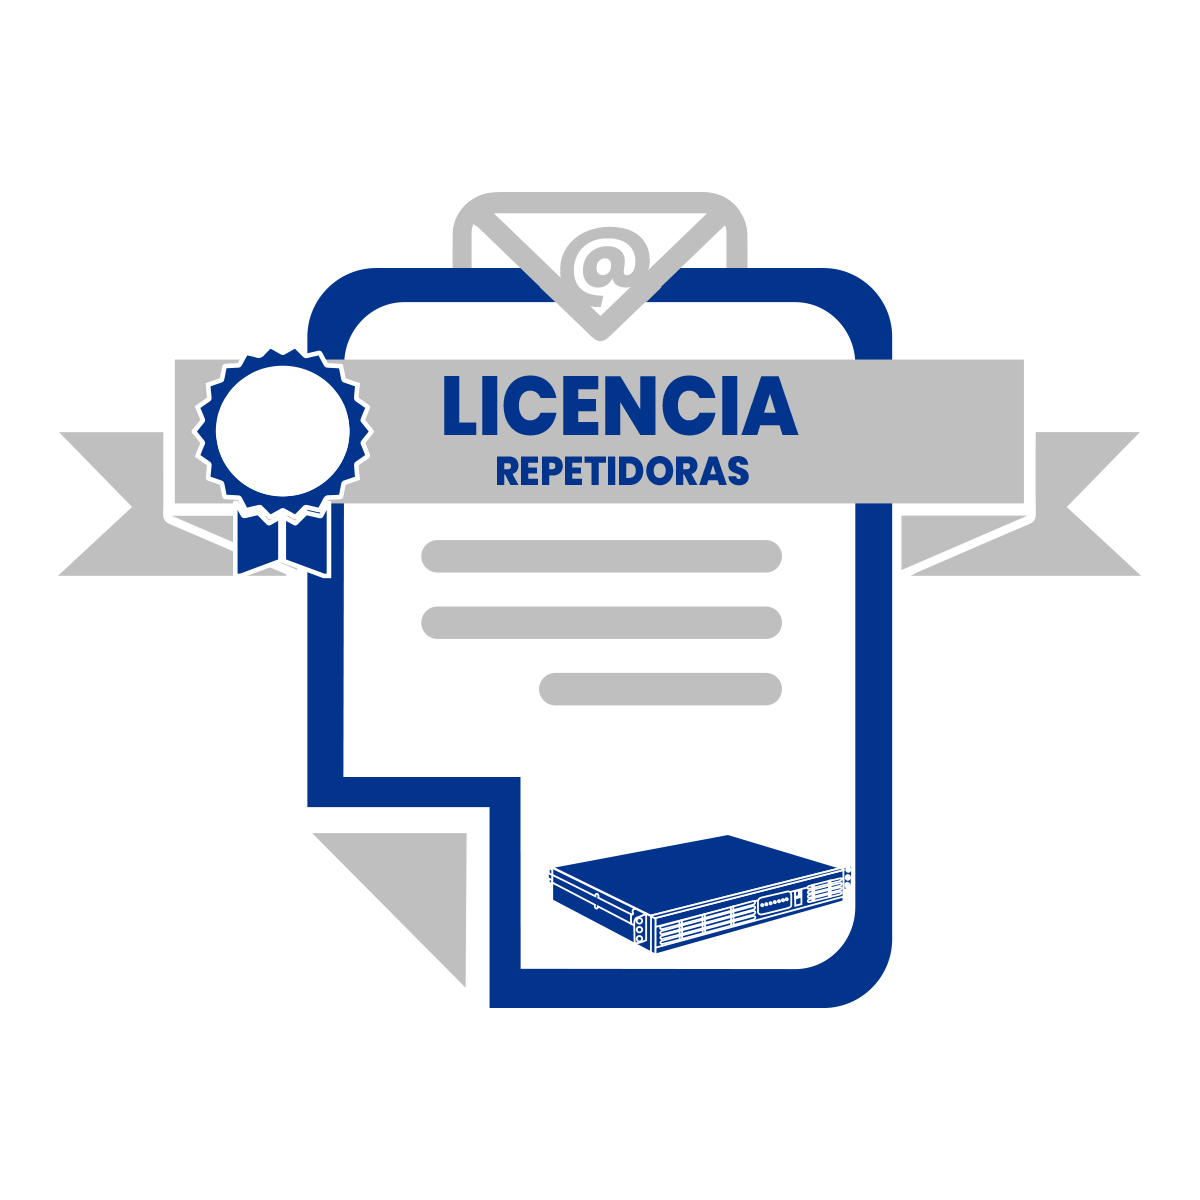 Licencia Motorola Capacity Plus HKVN4028 para Repetidora